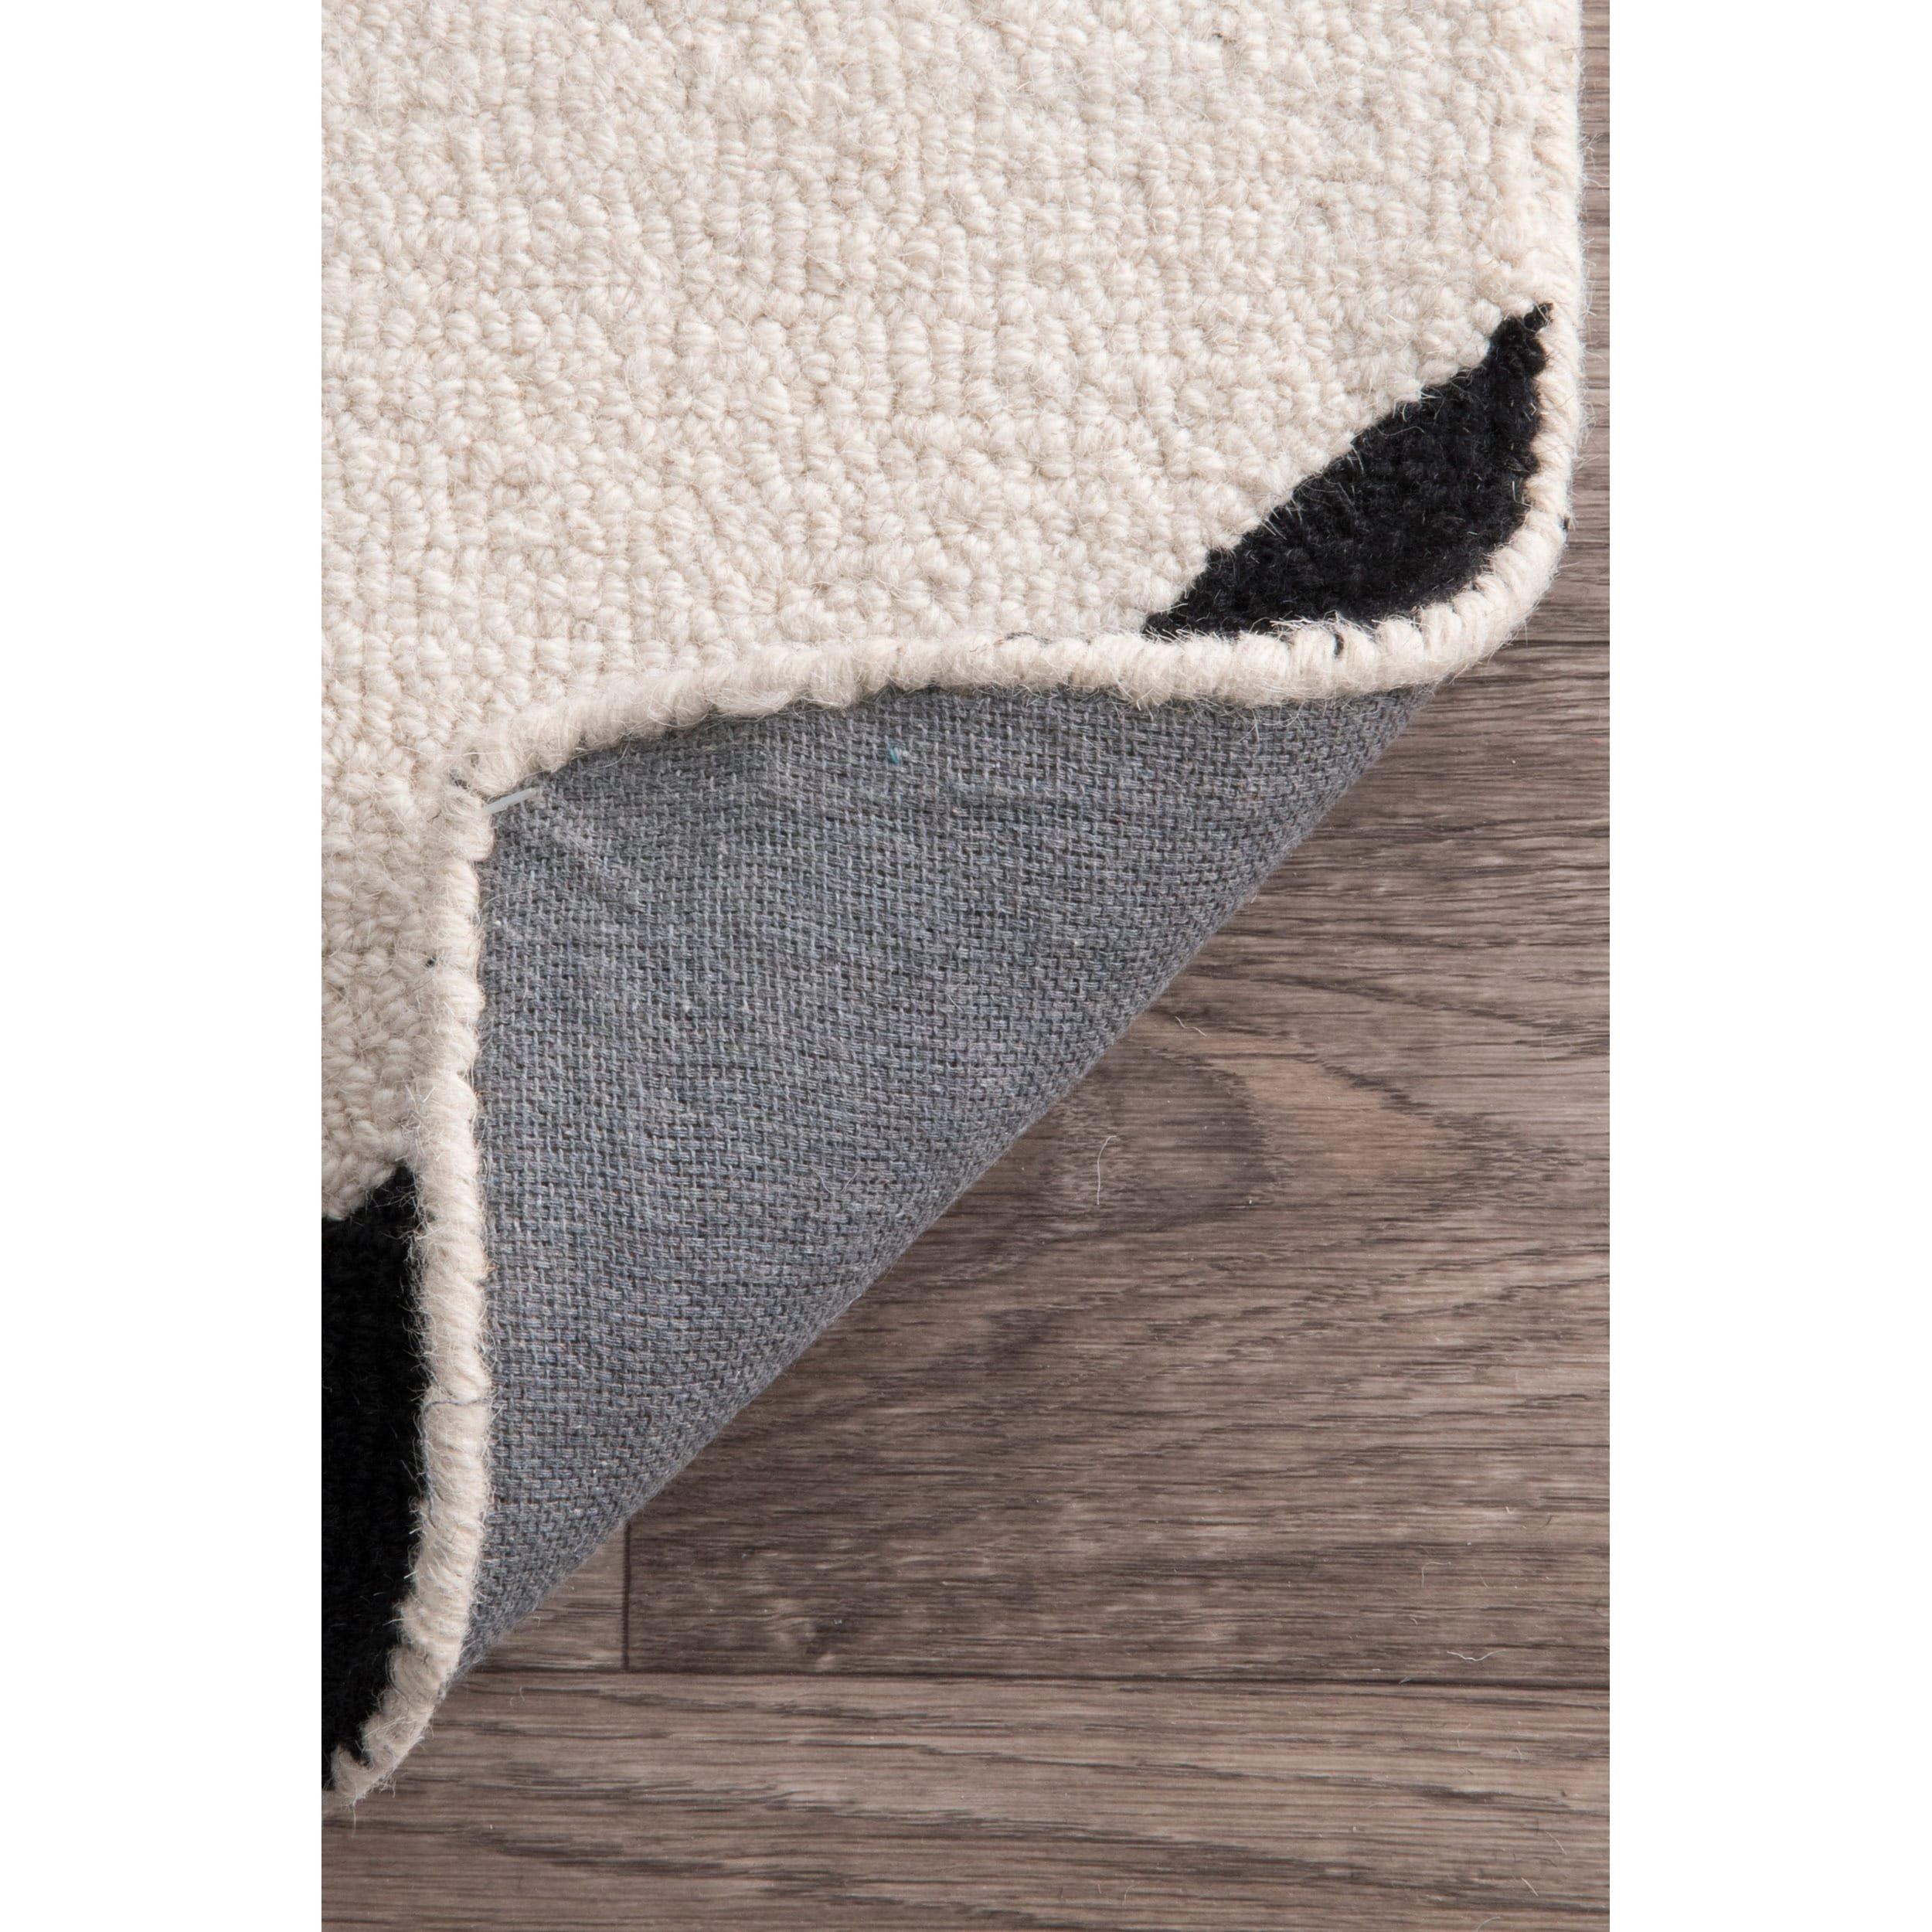 nuLOOM-Black-and-White-Handmade-Mod-Tiles-Wool-Area-Rug thumbnail 10